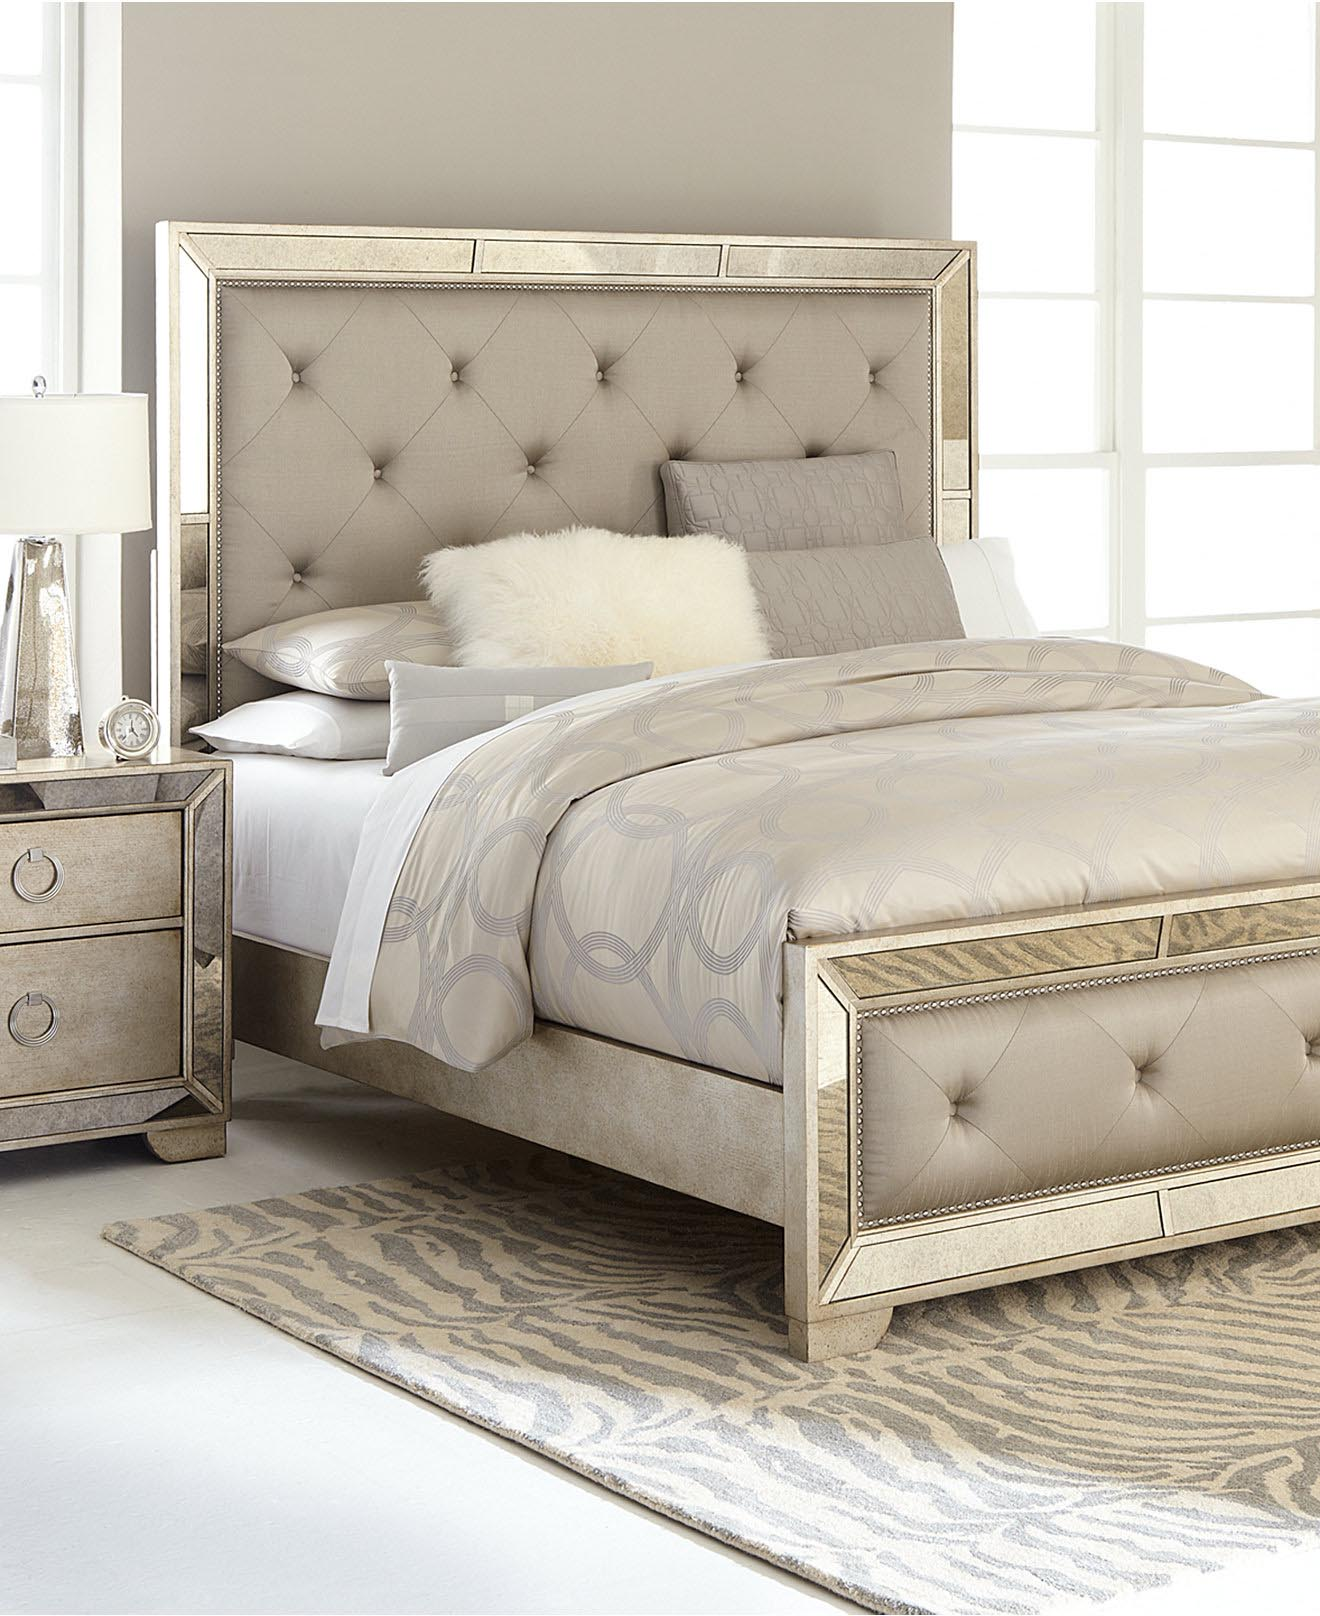 Mirrored Glass Bedroom Furniture Eo Furniture Coastal Bedroom Bedroom  Furniture Discounts Bedroom Furniture Trends